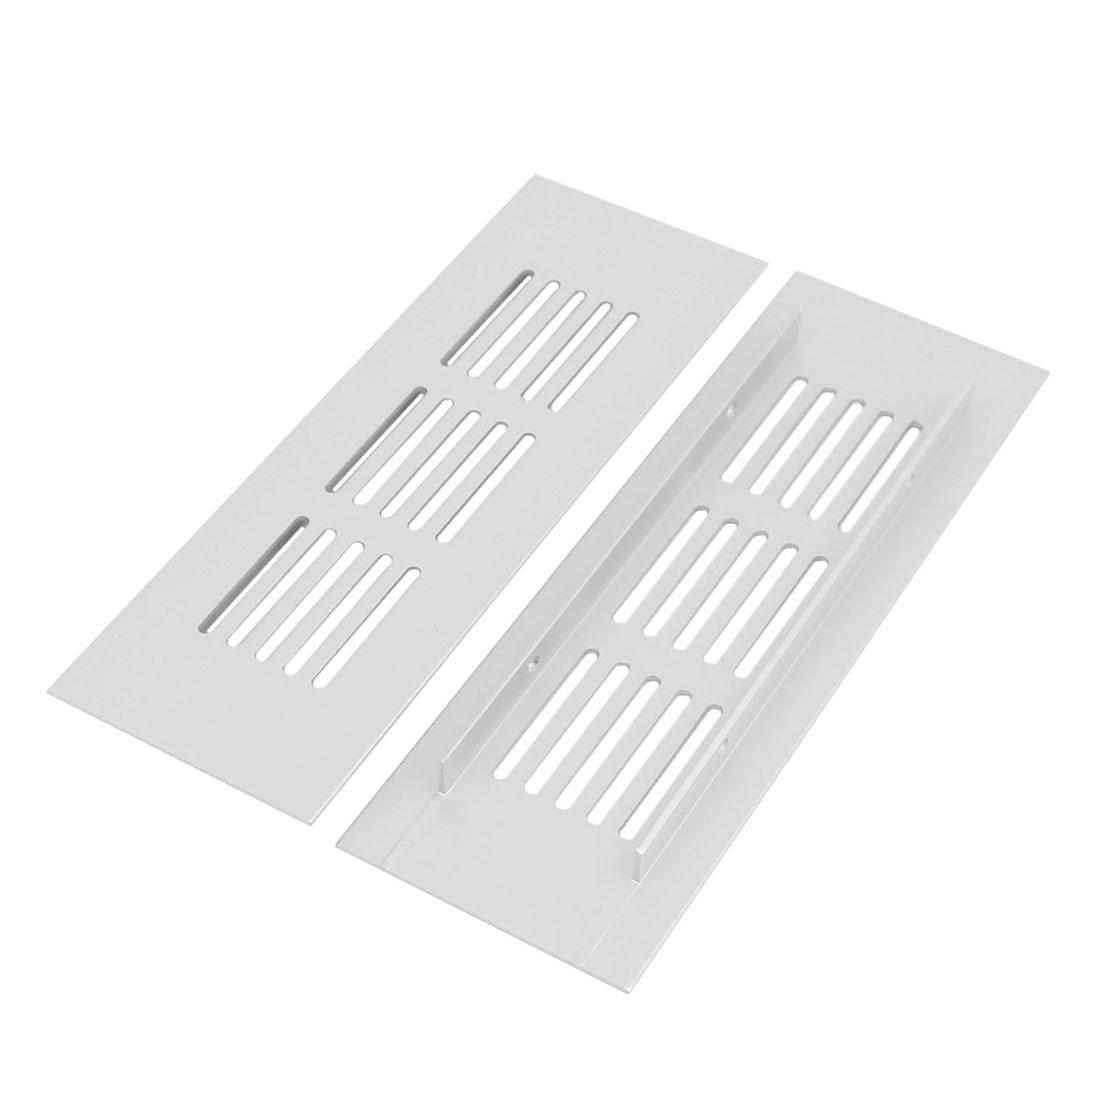 Wardrobe Cabinet Aluminum Alloy Air Vent Ventilation Grille 150mmx50mmx9mm 2pcs